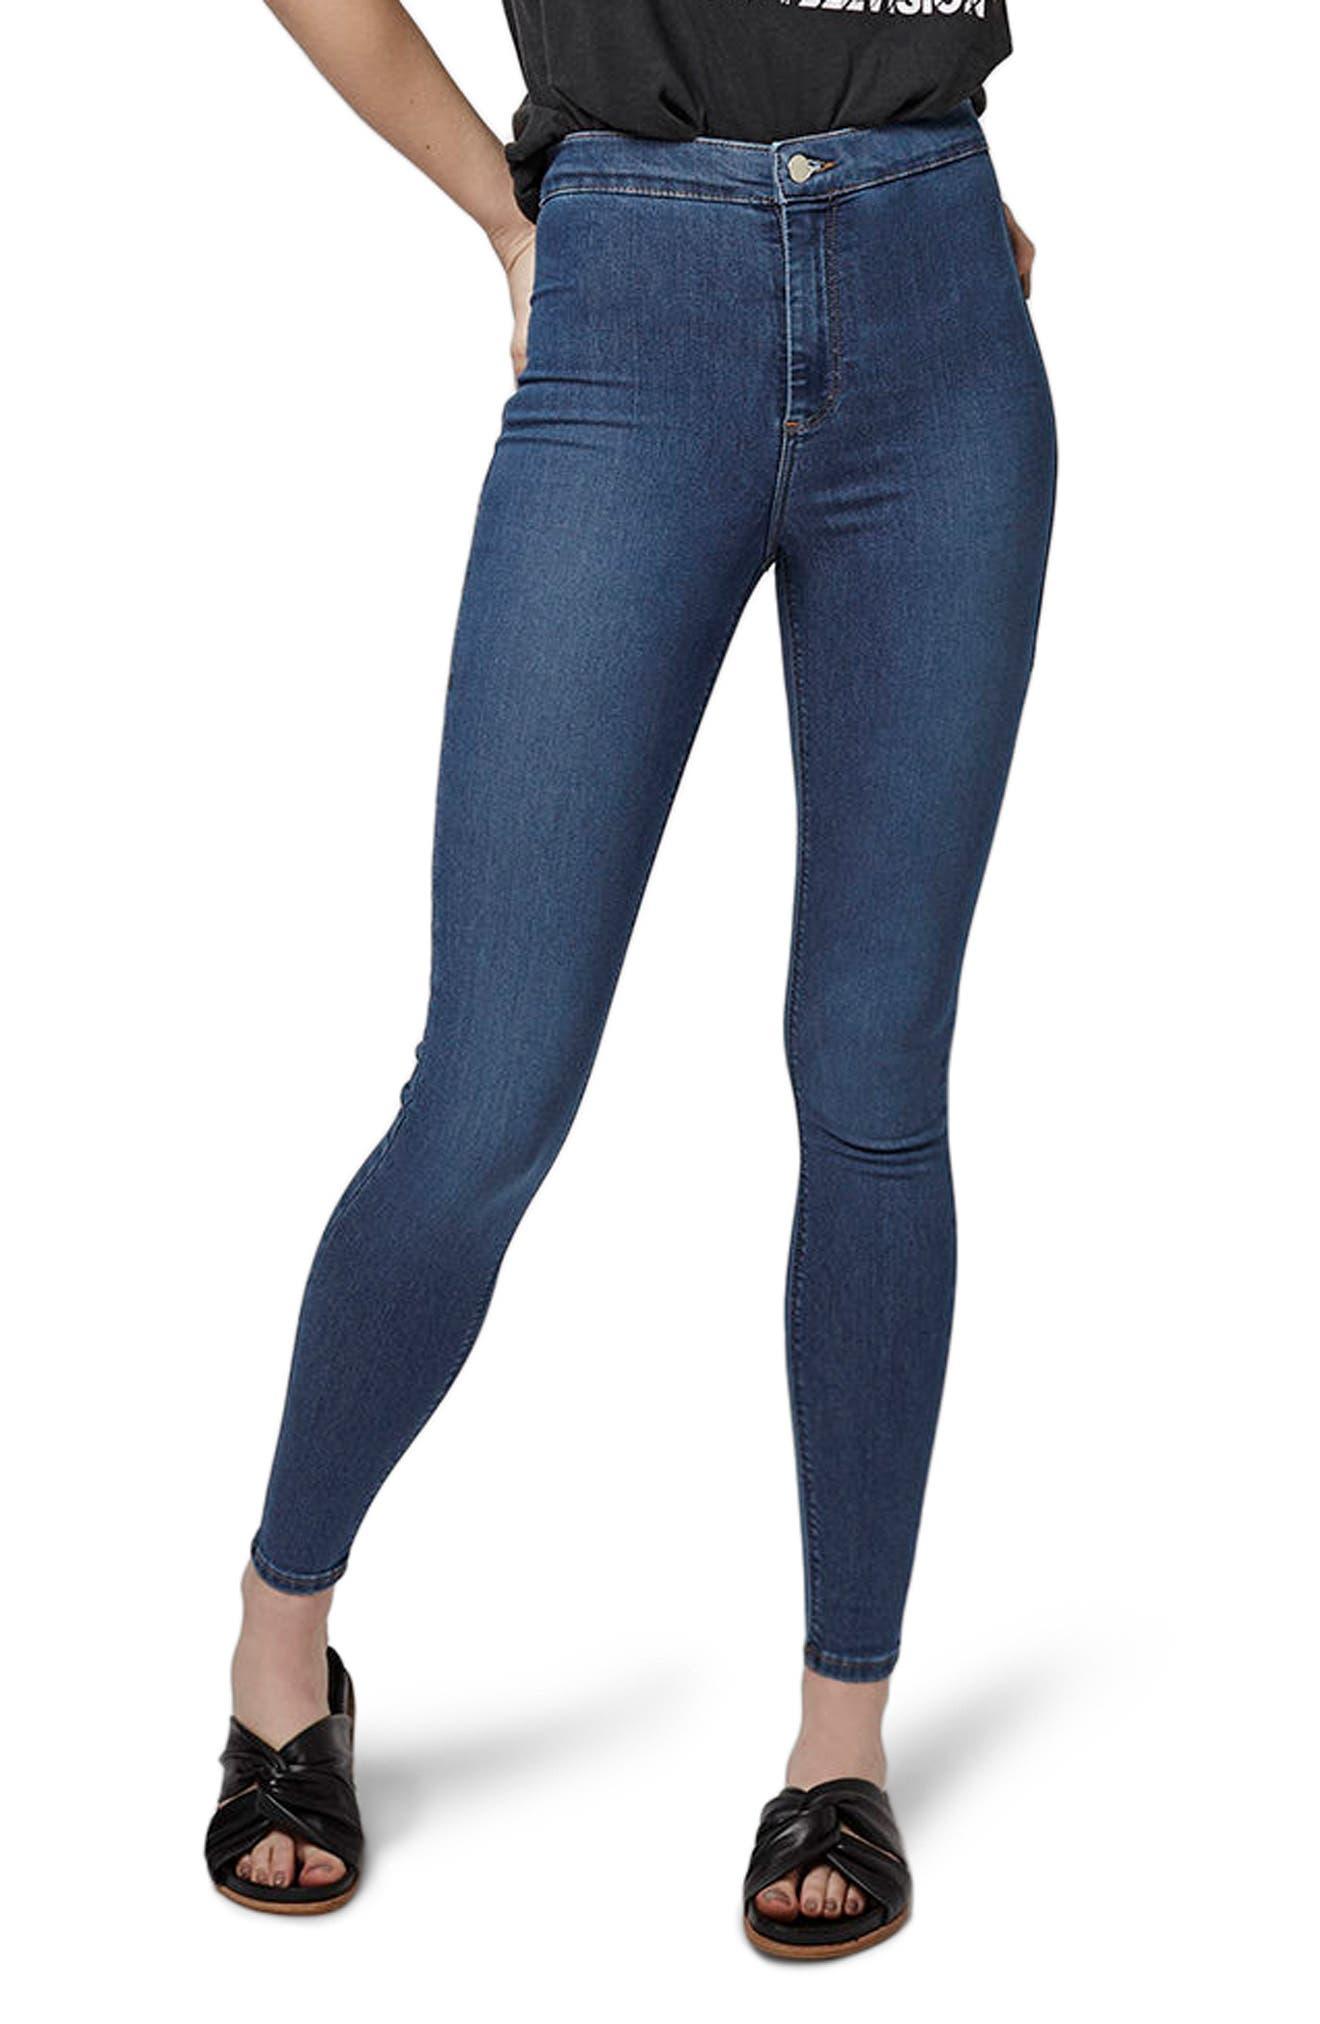 TOPSHOP Joni Mid Denim Jeans, Main, color, MID DENIM